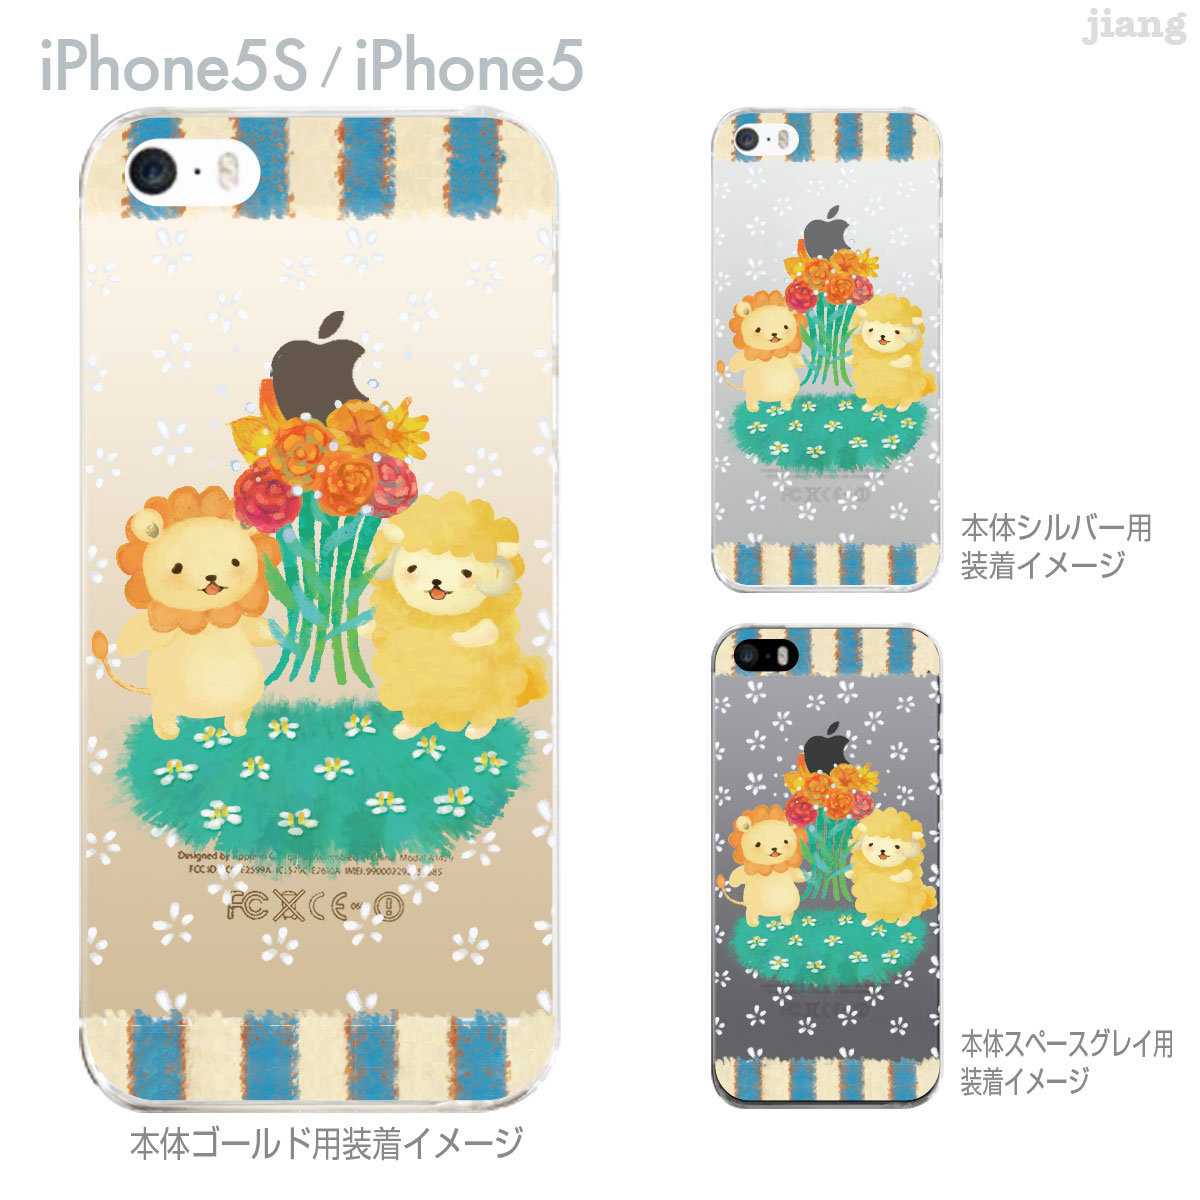 clear arts ジアン 303sh iphone5s iphone5 ケース 304sh カバー